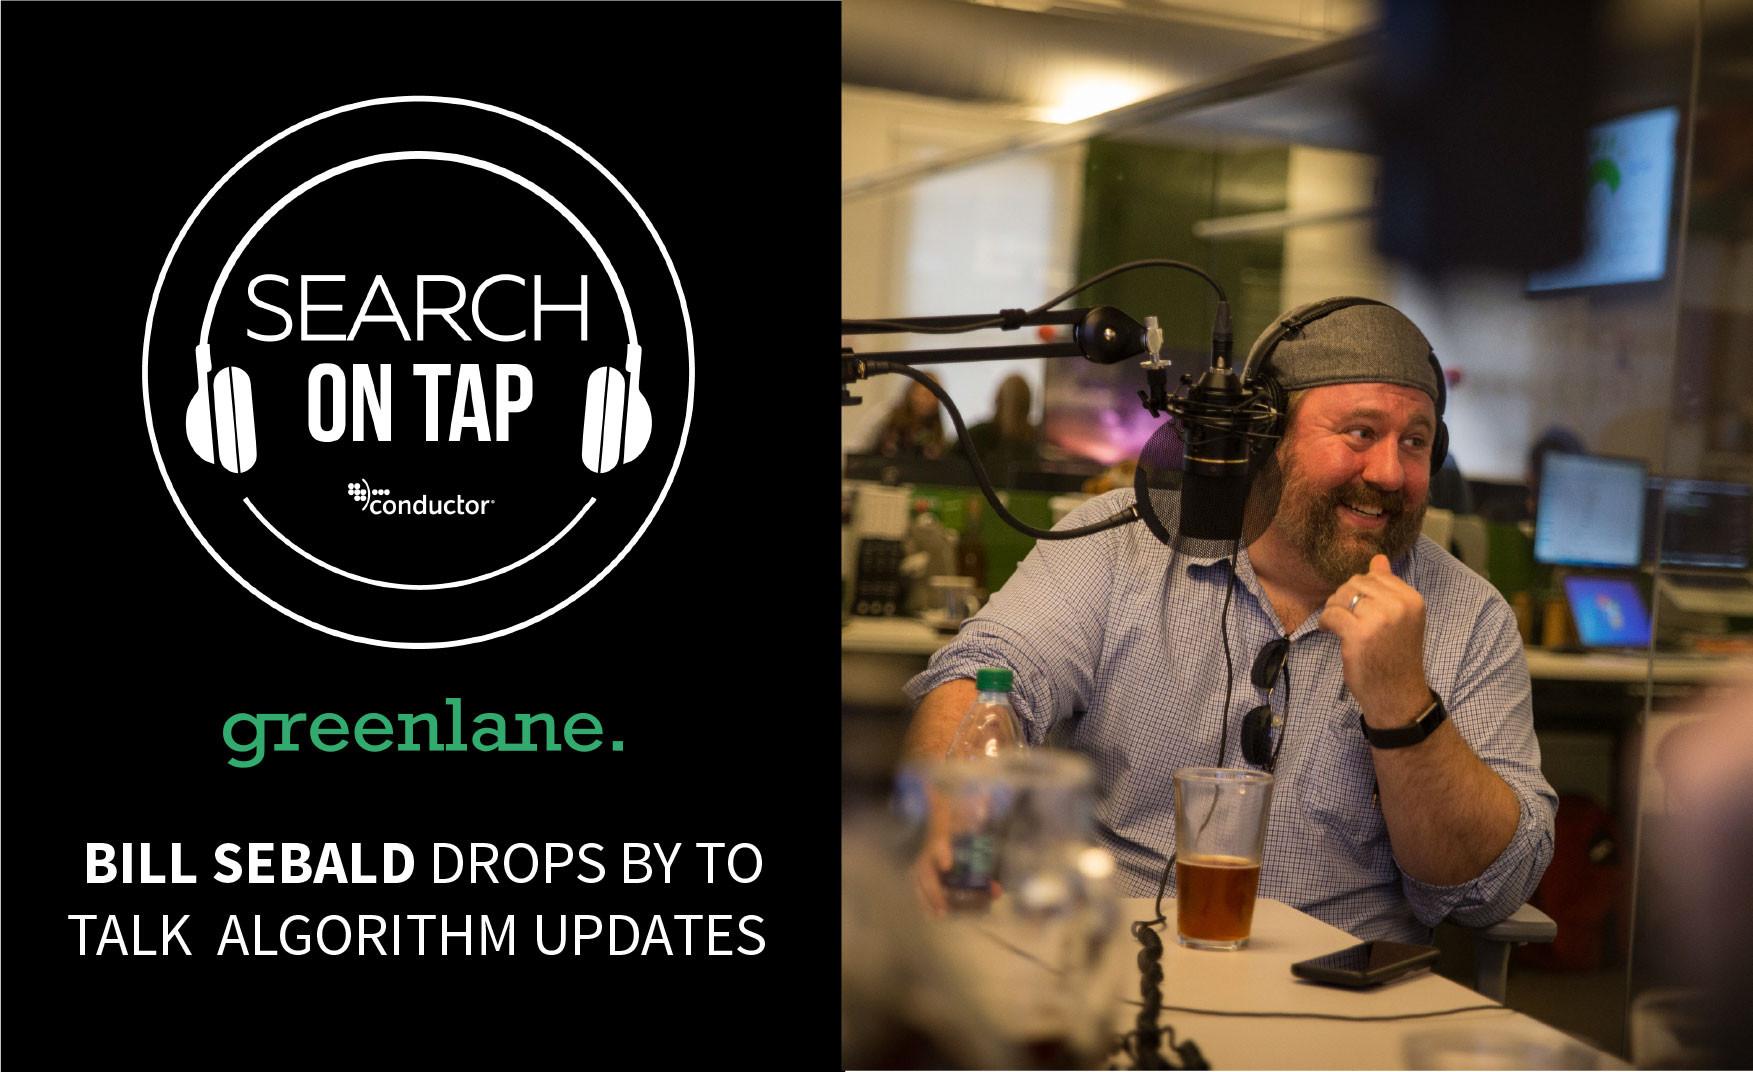 Algo Updates Got You Down? w/ Bill Sebald of Greenlane Marketing - Search On Tap Podcast - Ep 3